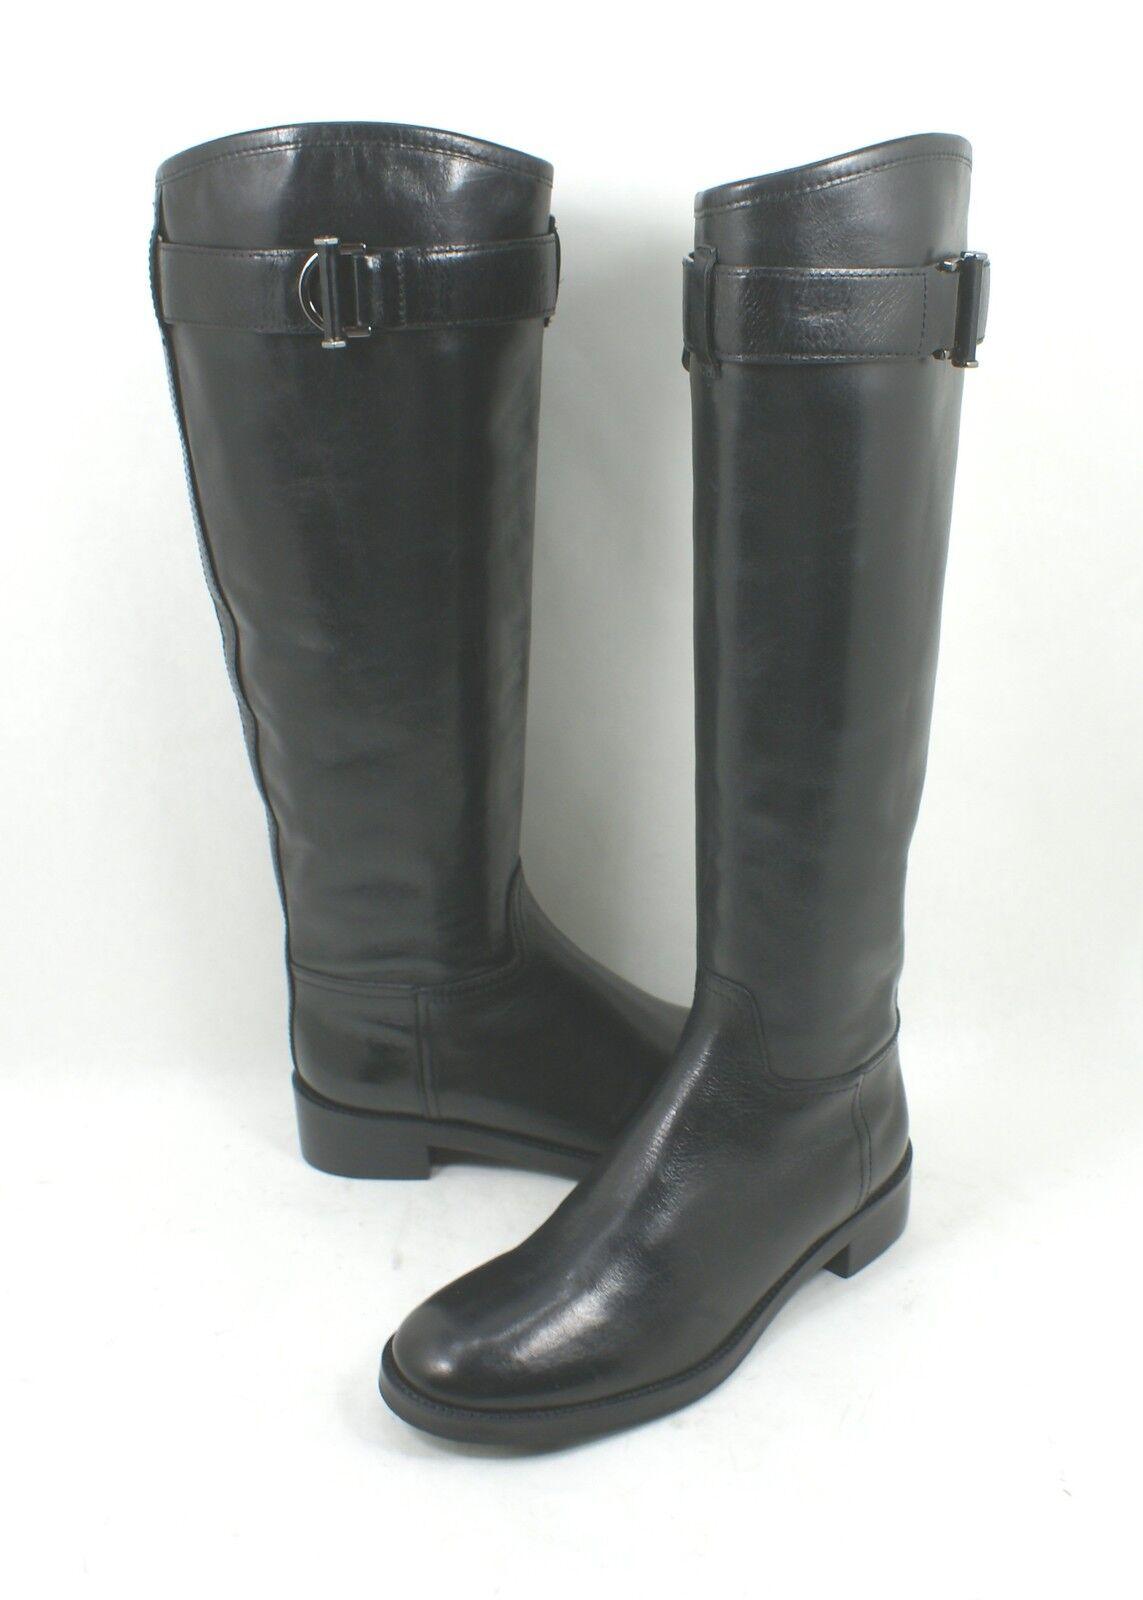 garanzia di credito Tory Tory Tory Burch  Grace  Dimensione 6.5 M nero Leather Knee High Riding stivali  produttori fornitura diretta